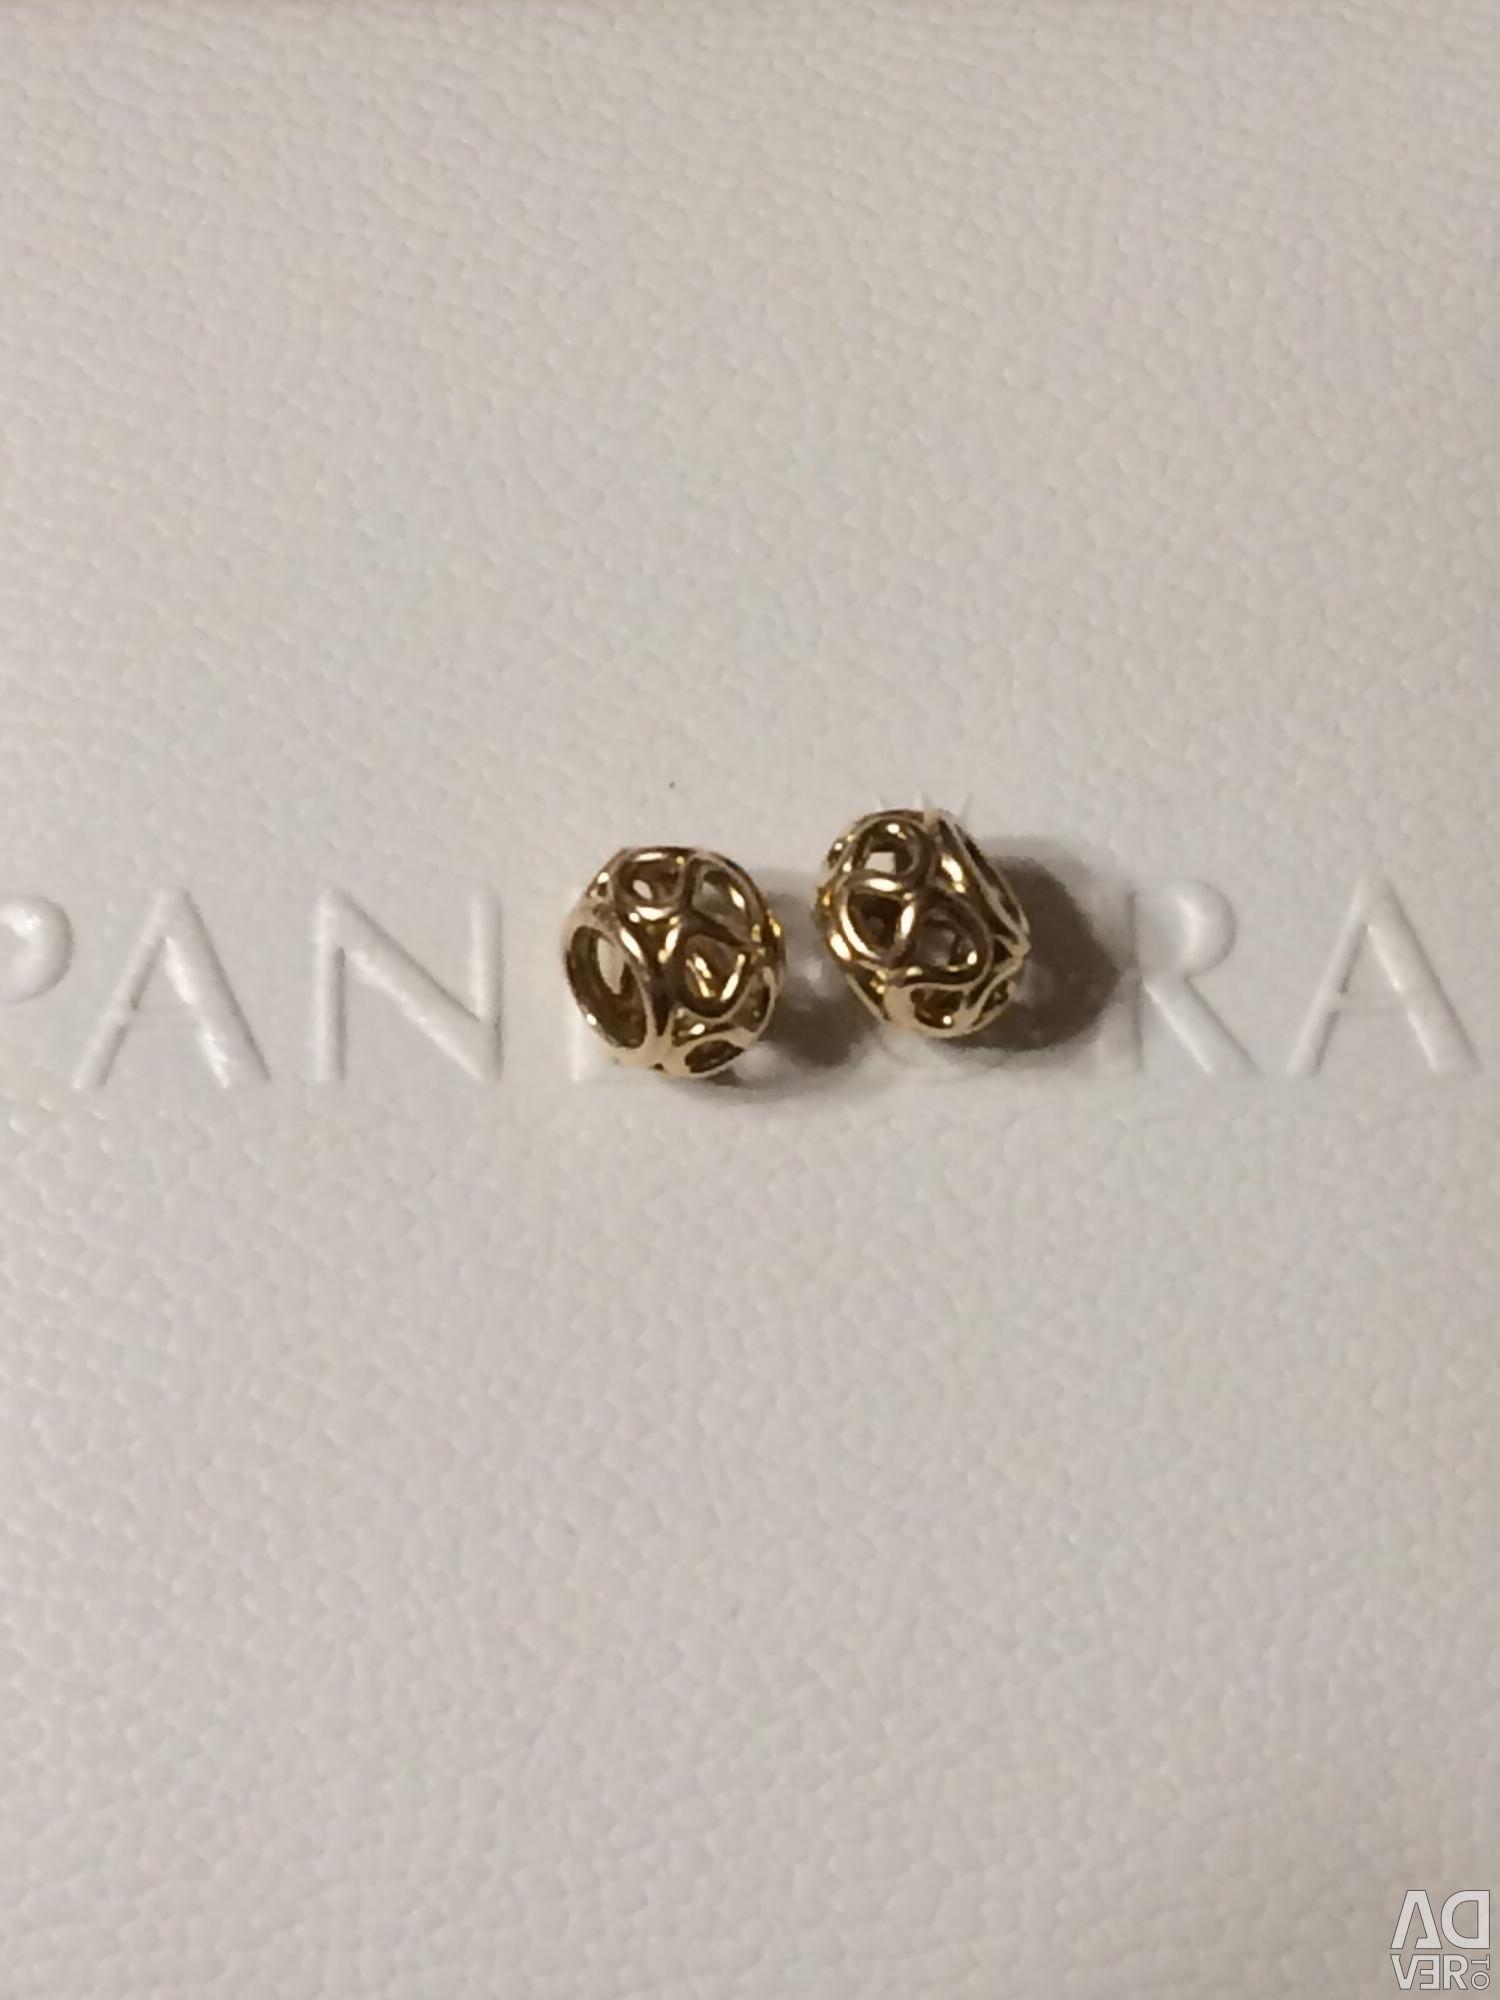 Pandora Charms Gold 585 City Krasnodar Advert To Sell Price 5 500 Rub Posted 09 01 2019